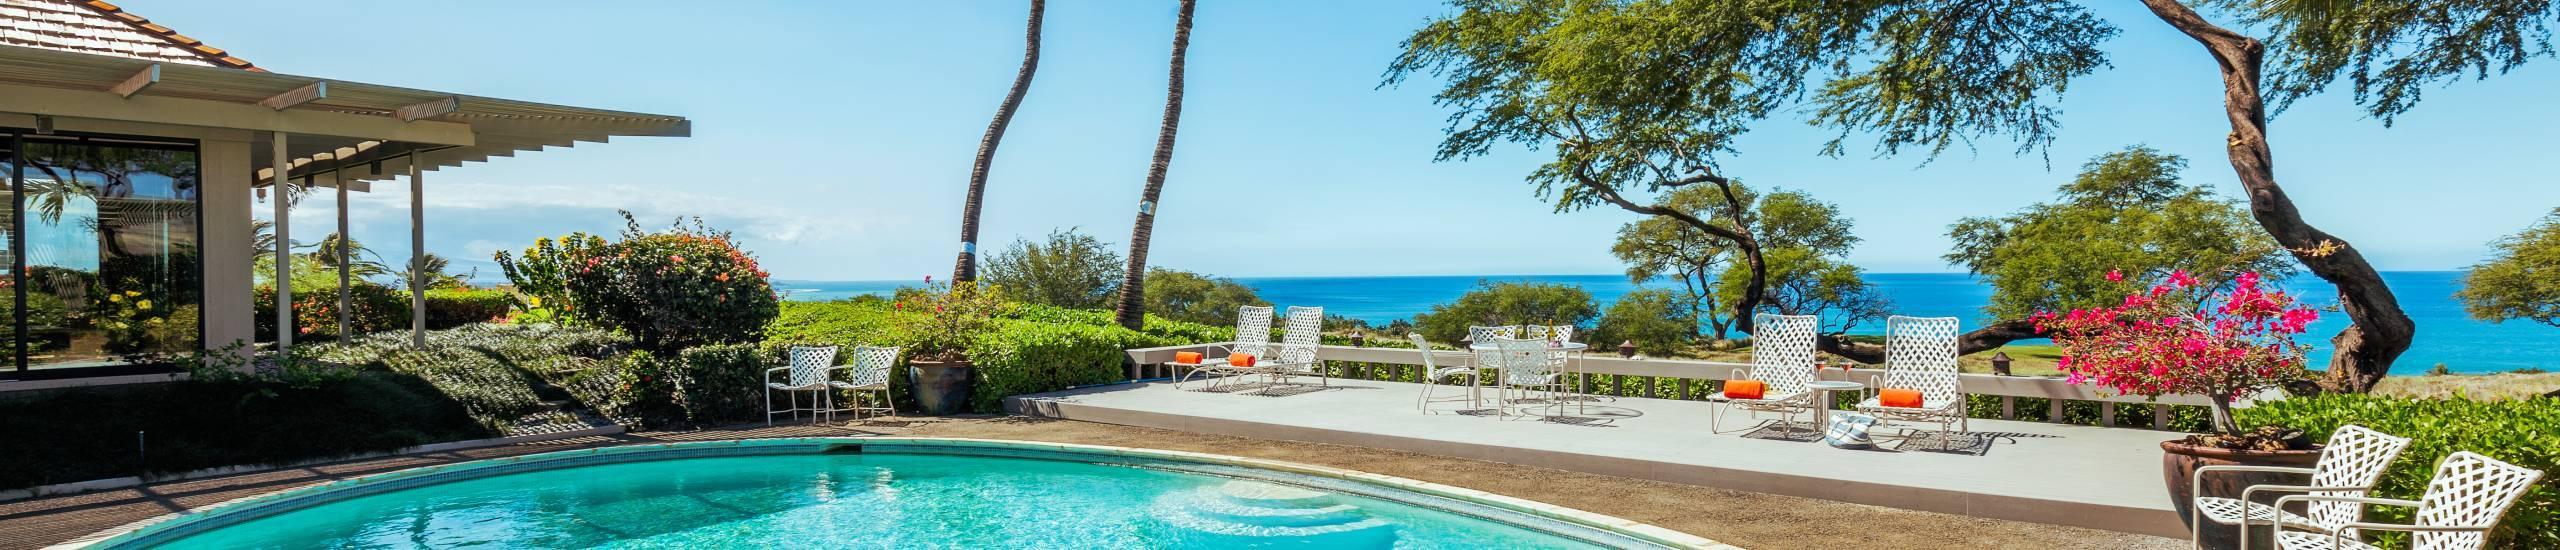 Mauna Kea Fairways 25 Private Pool View